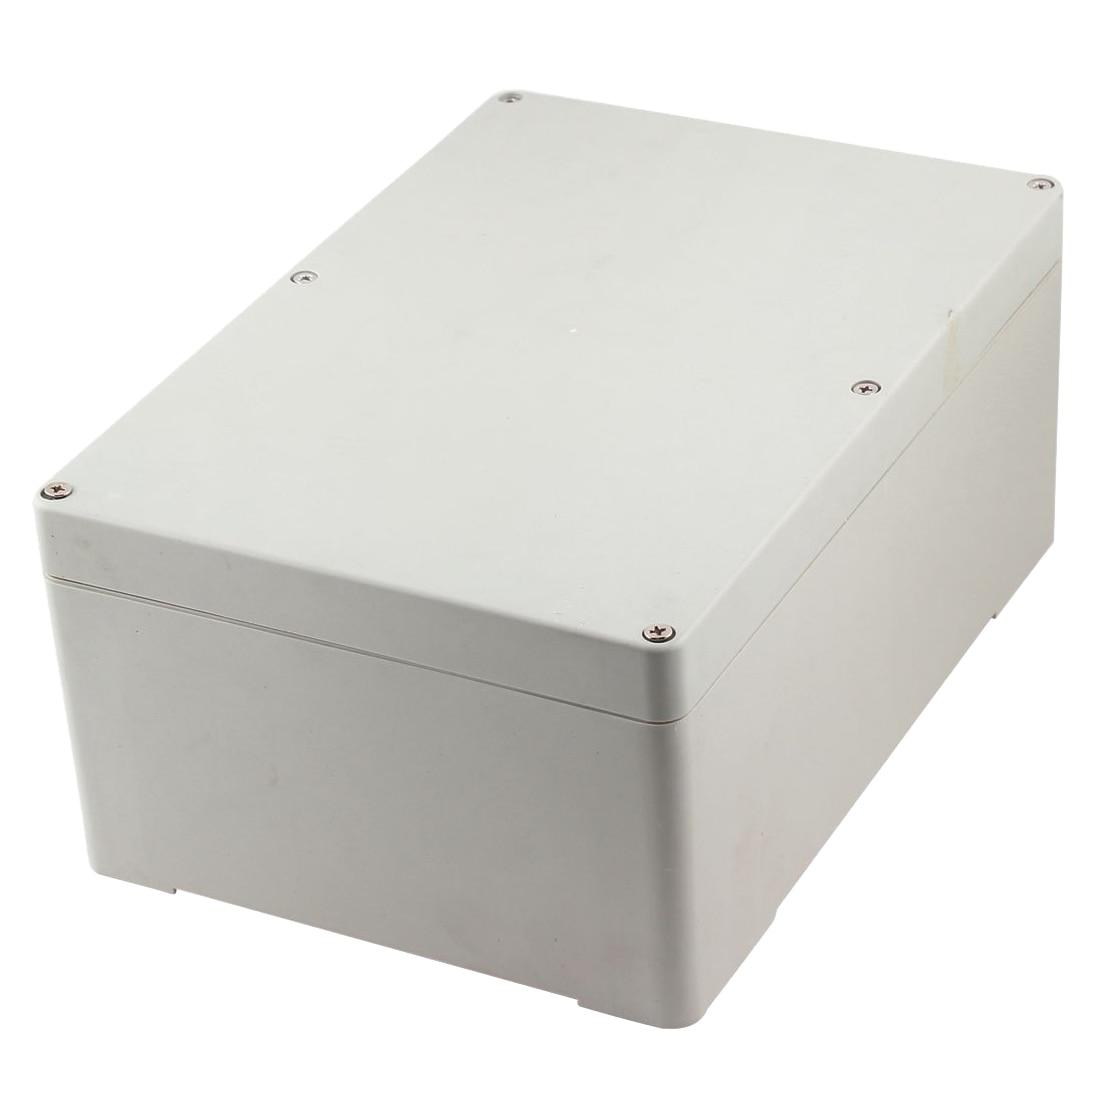 High Quality Waterproof Plastic Enclosure Case Junction Box 265mm x 185mm x 115mm high tech plastic electric torch enclosure mould